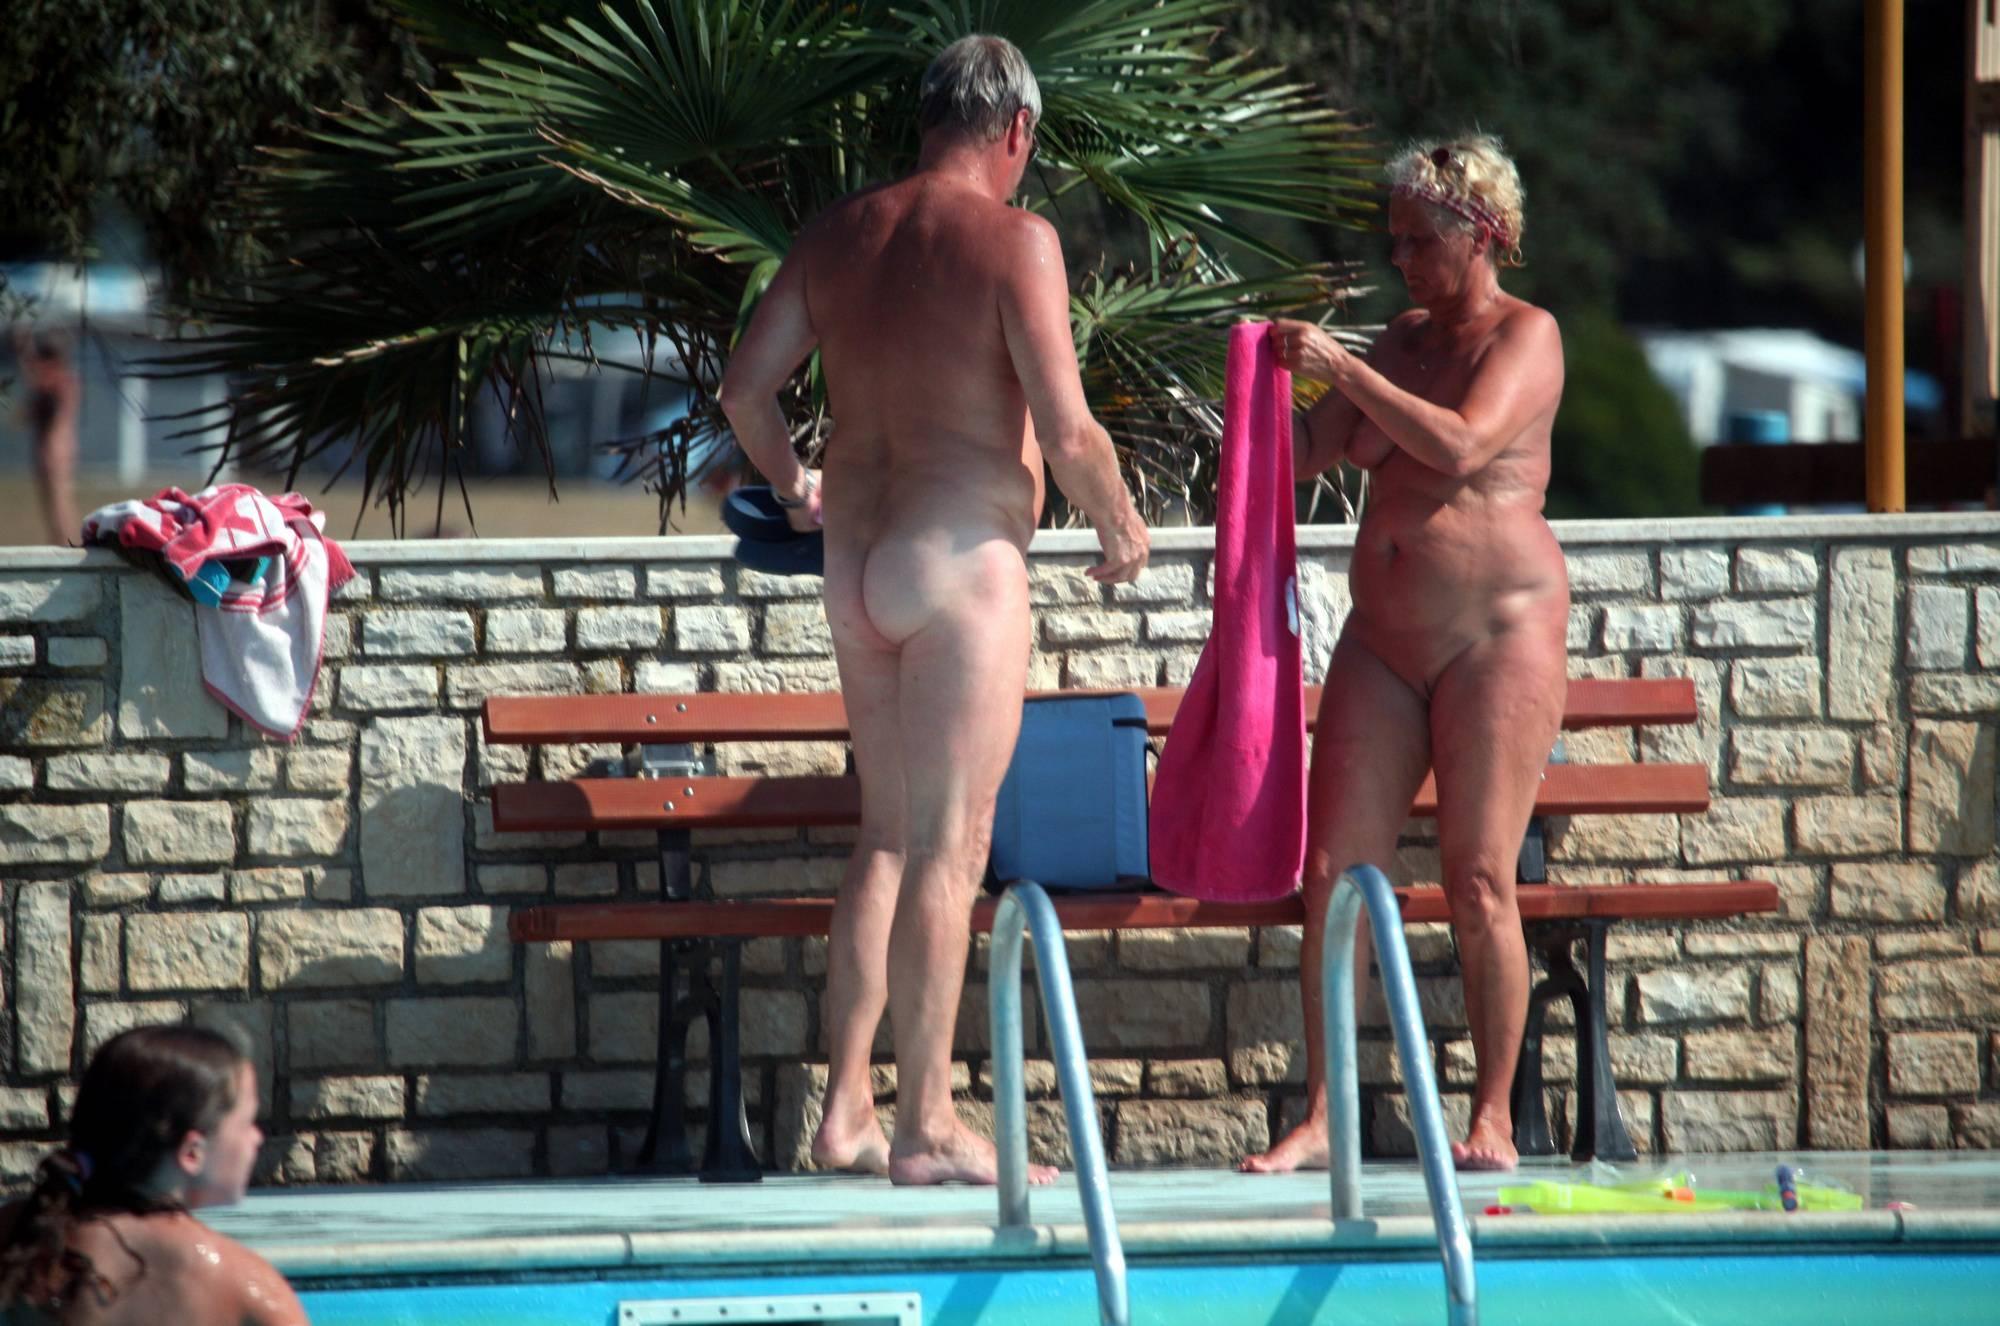 Nudist Photos Naturist Pool Cleaning-Up - 2